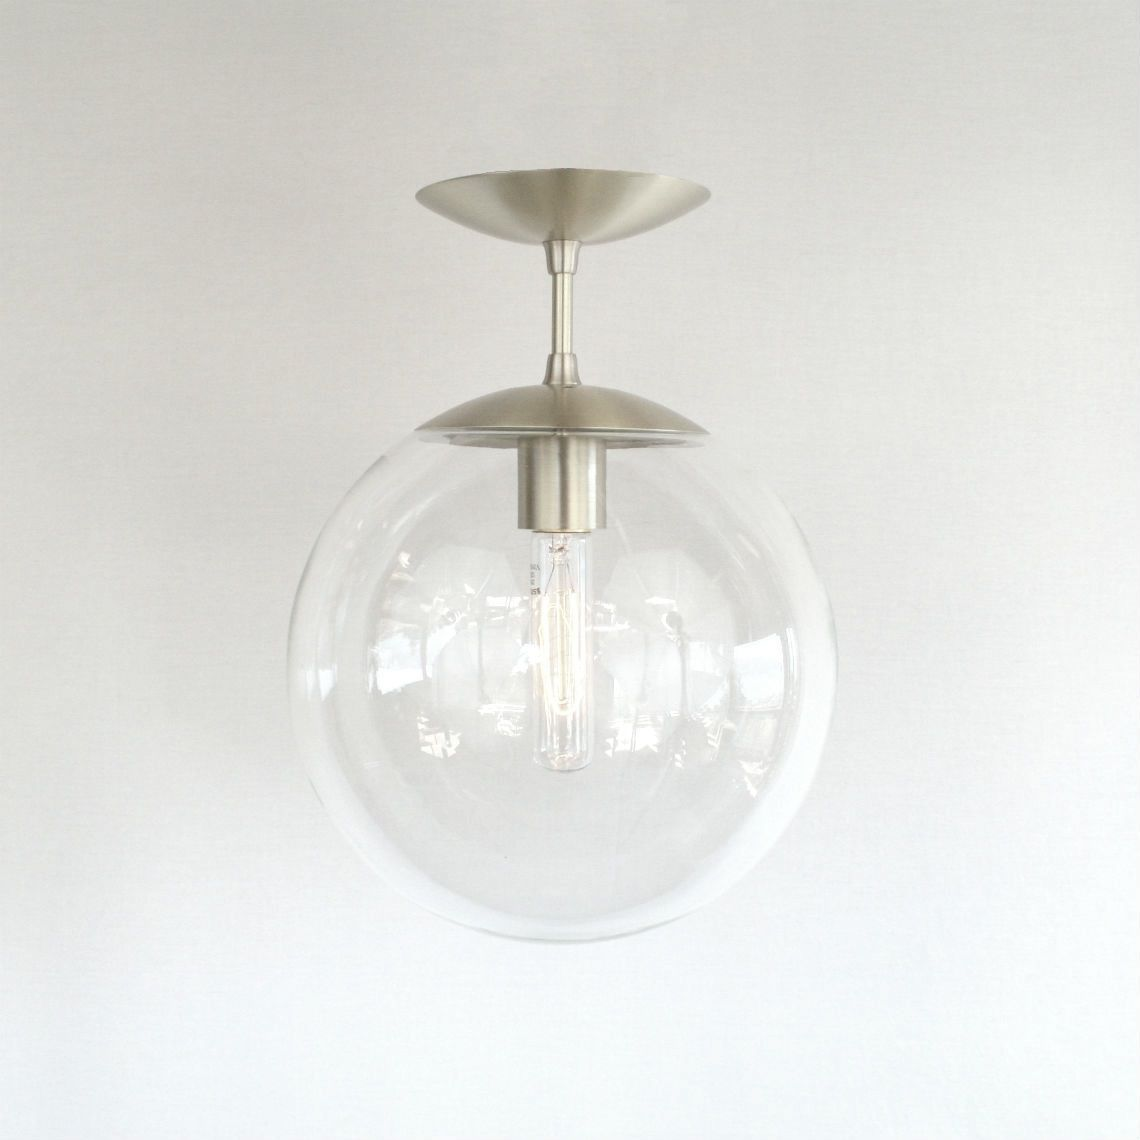 Orbiter 10 semi flush pendant light flying saucer canopy and mid century modern clear 10 globe semi flush pendant light with its flying saucer shaped arubaitofo Gallery